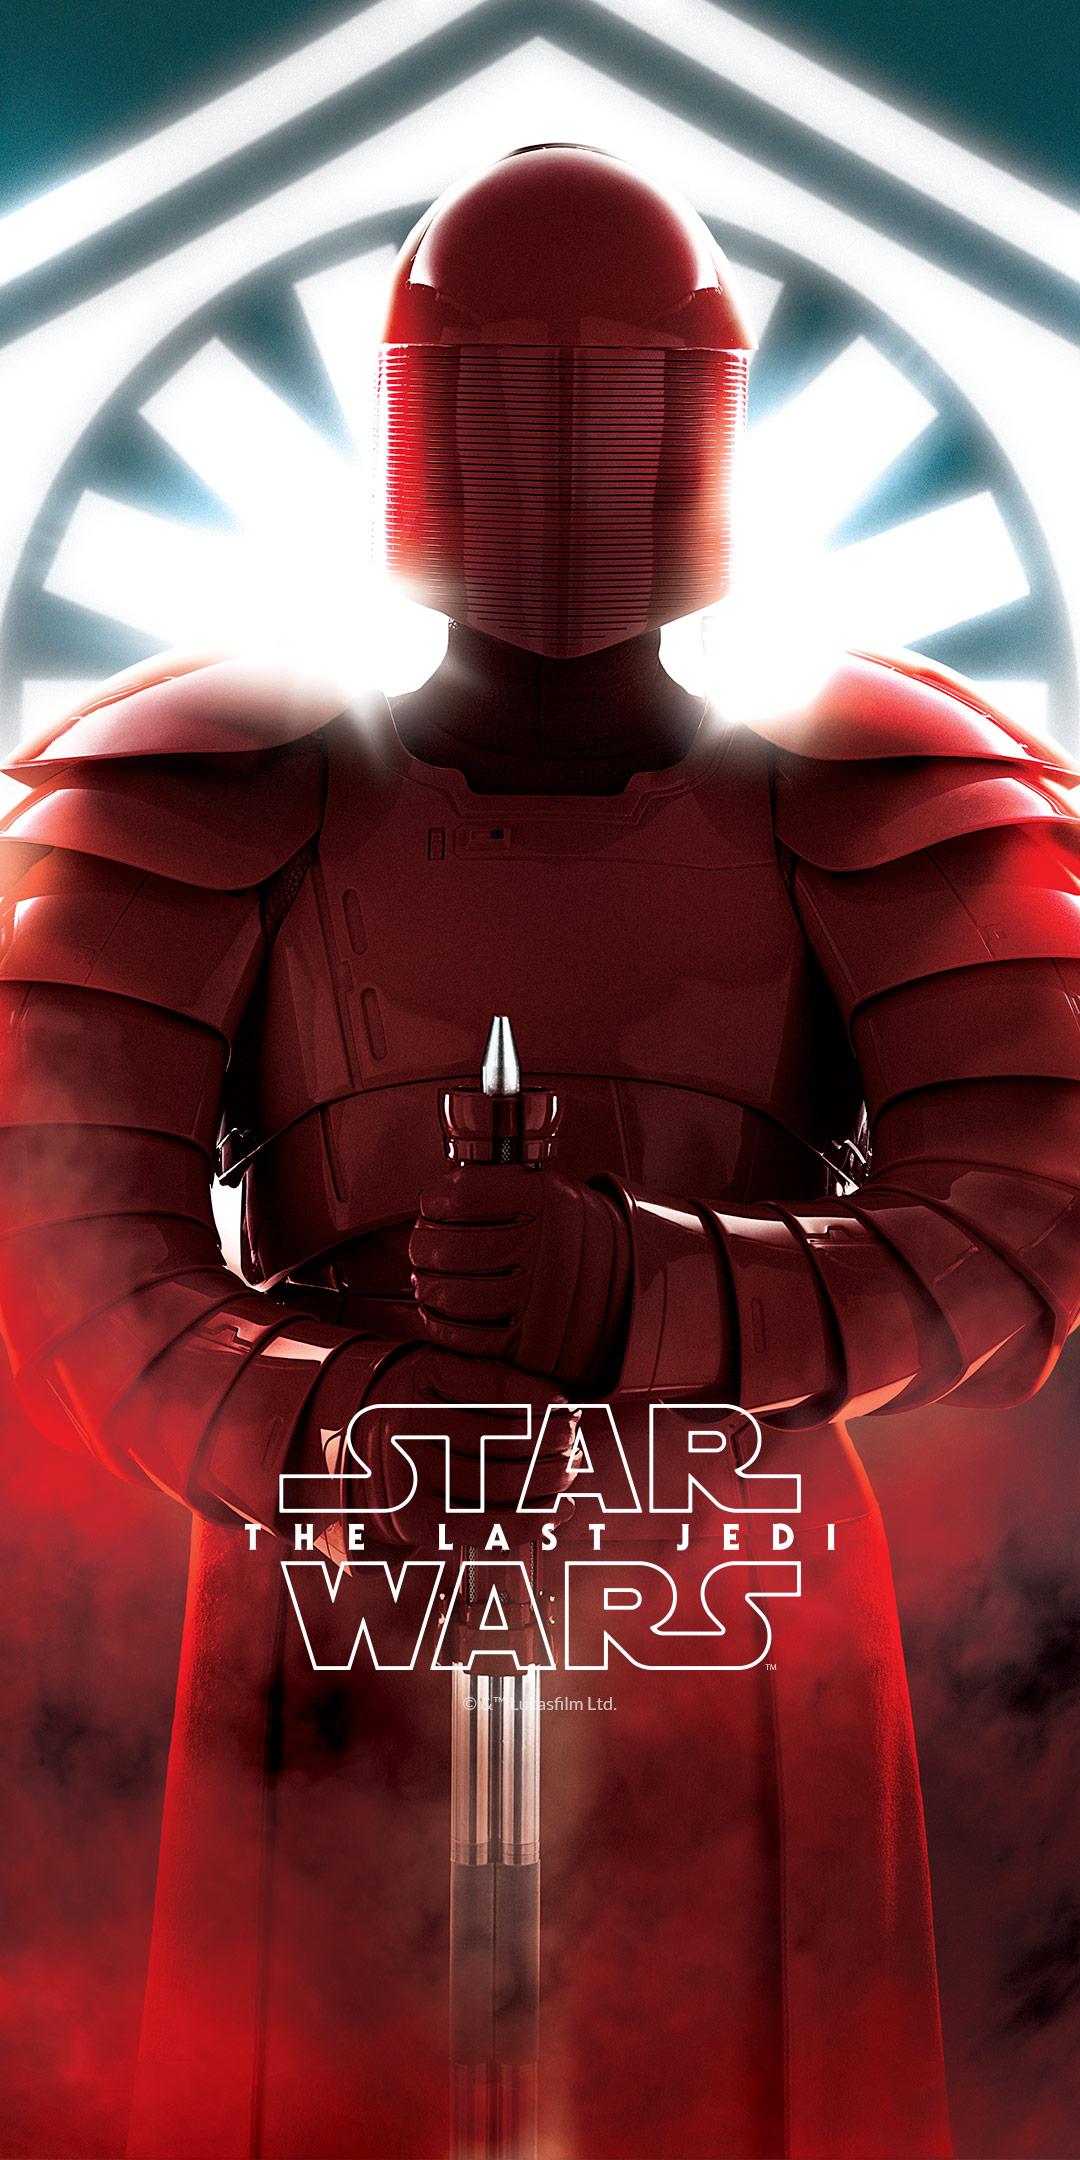 Oneplus 5t Star Wars The Last Jedi Wallpapers Download Leaked Slashgear